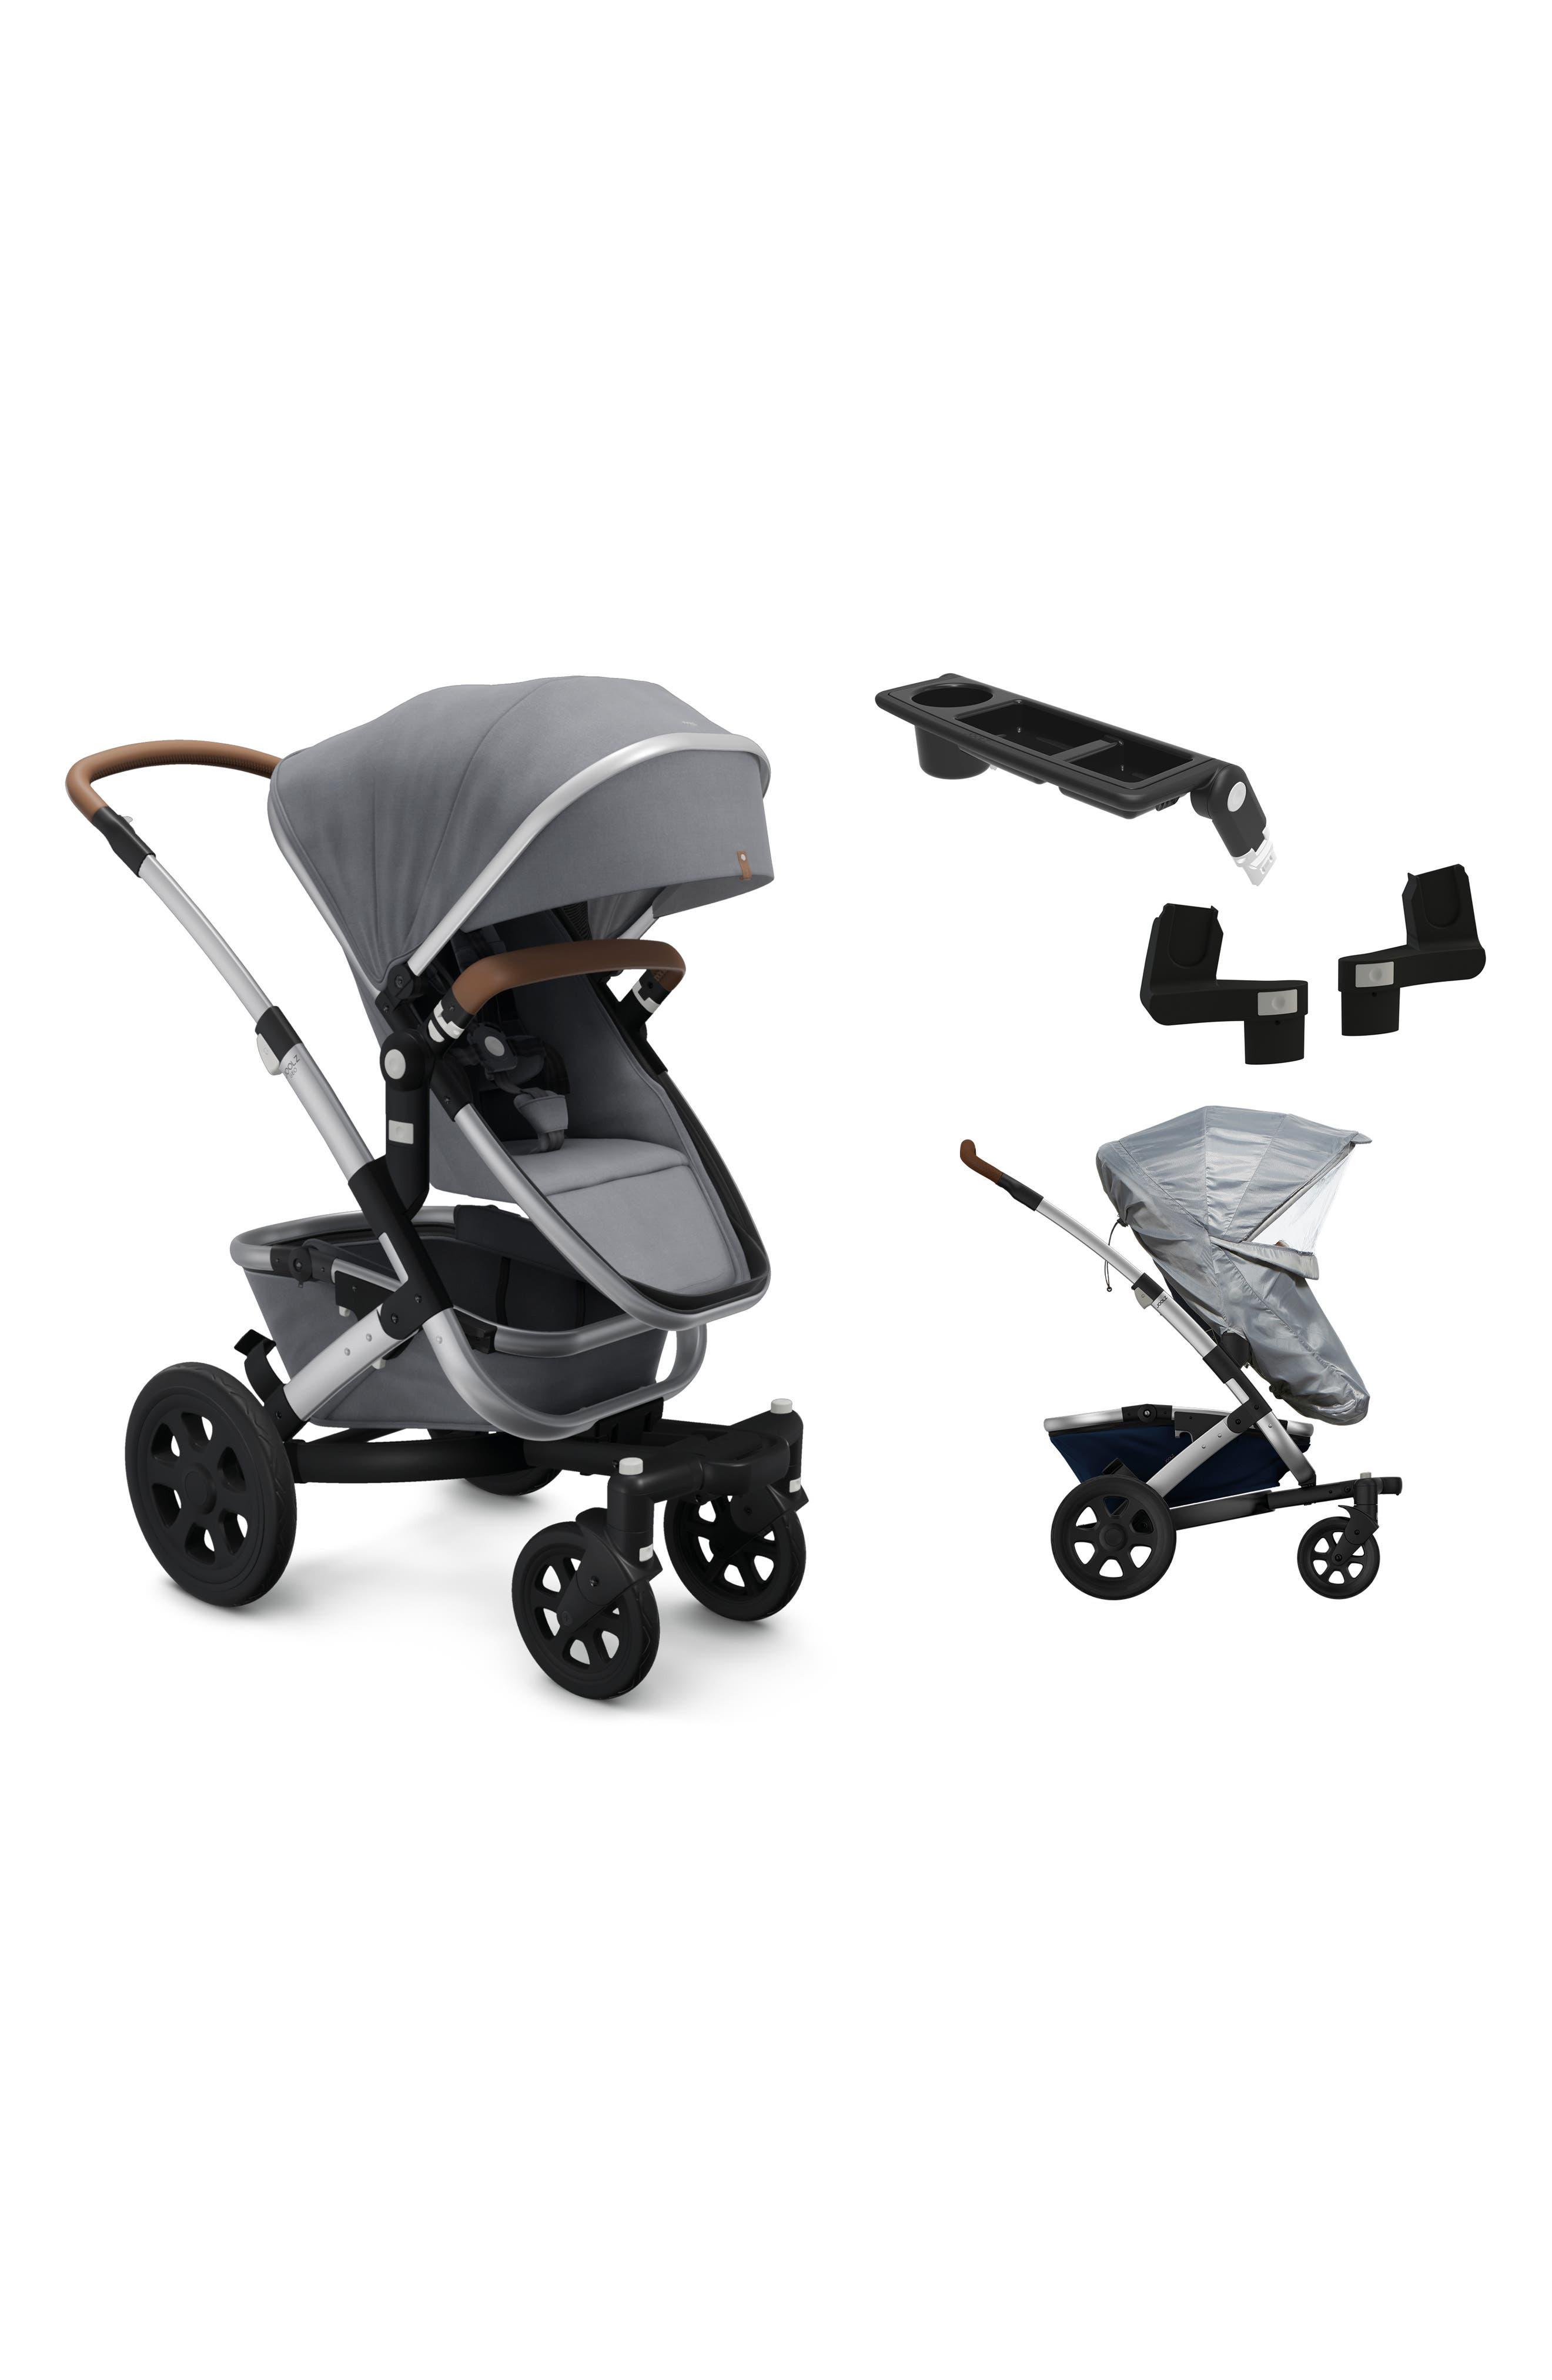 Joolz Infant Joolz Geo2 Complete Stroller & Accessories Bundle, Size One Size - Grey